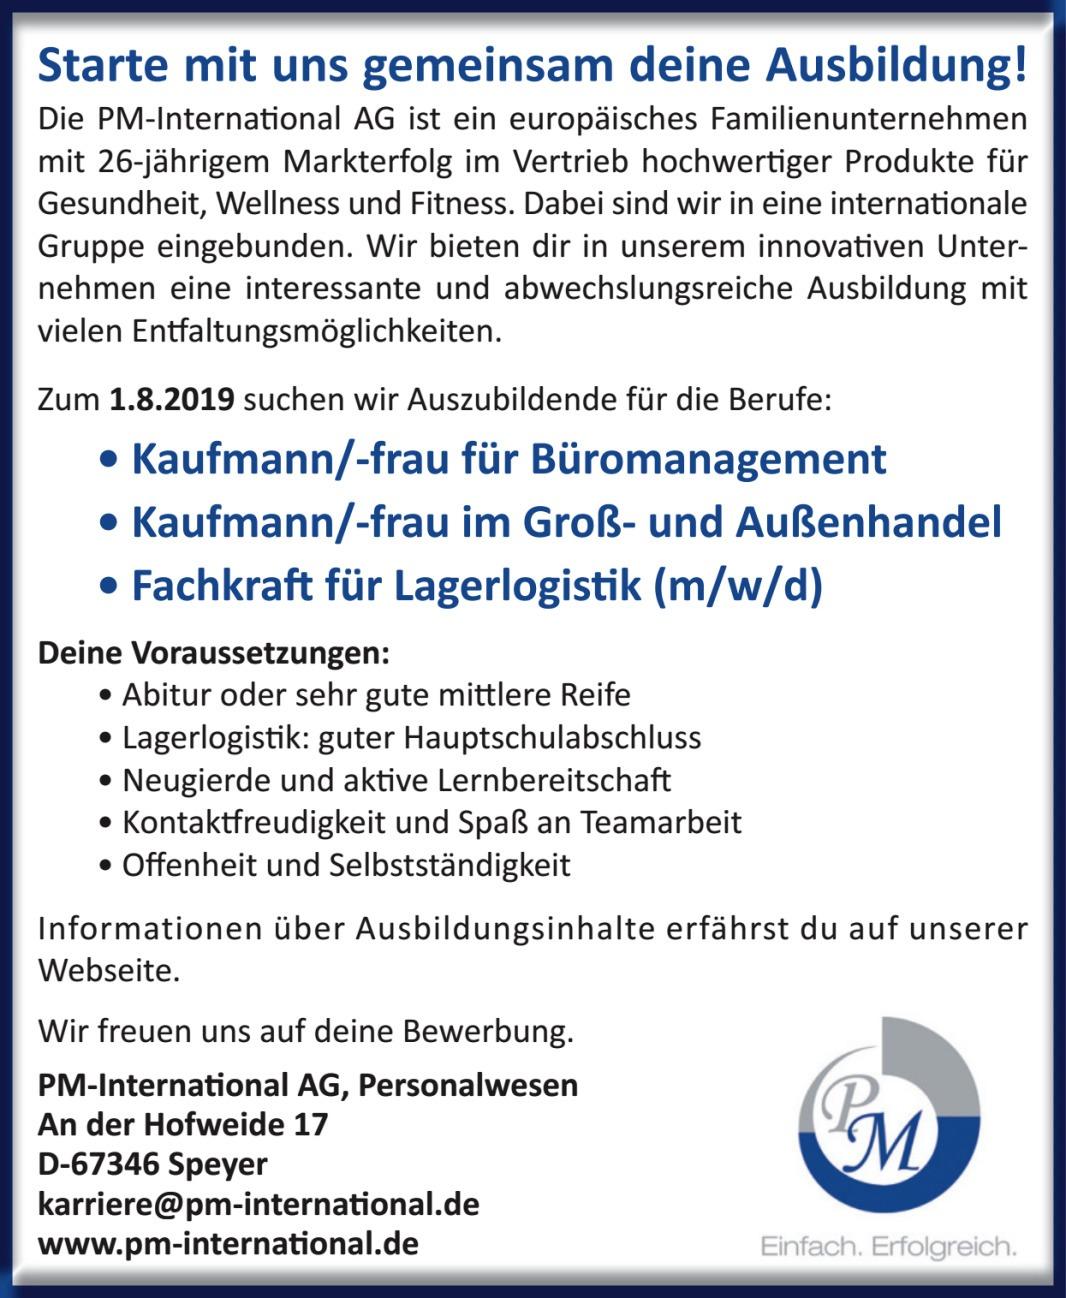 PM-International AG, Personalwesen